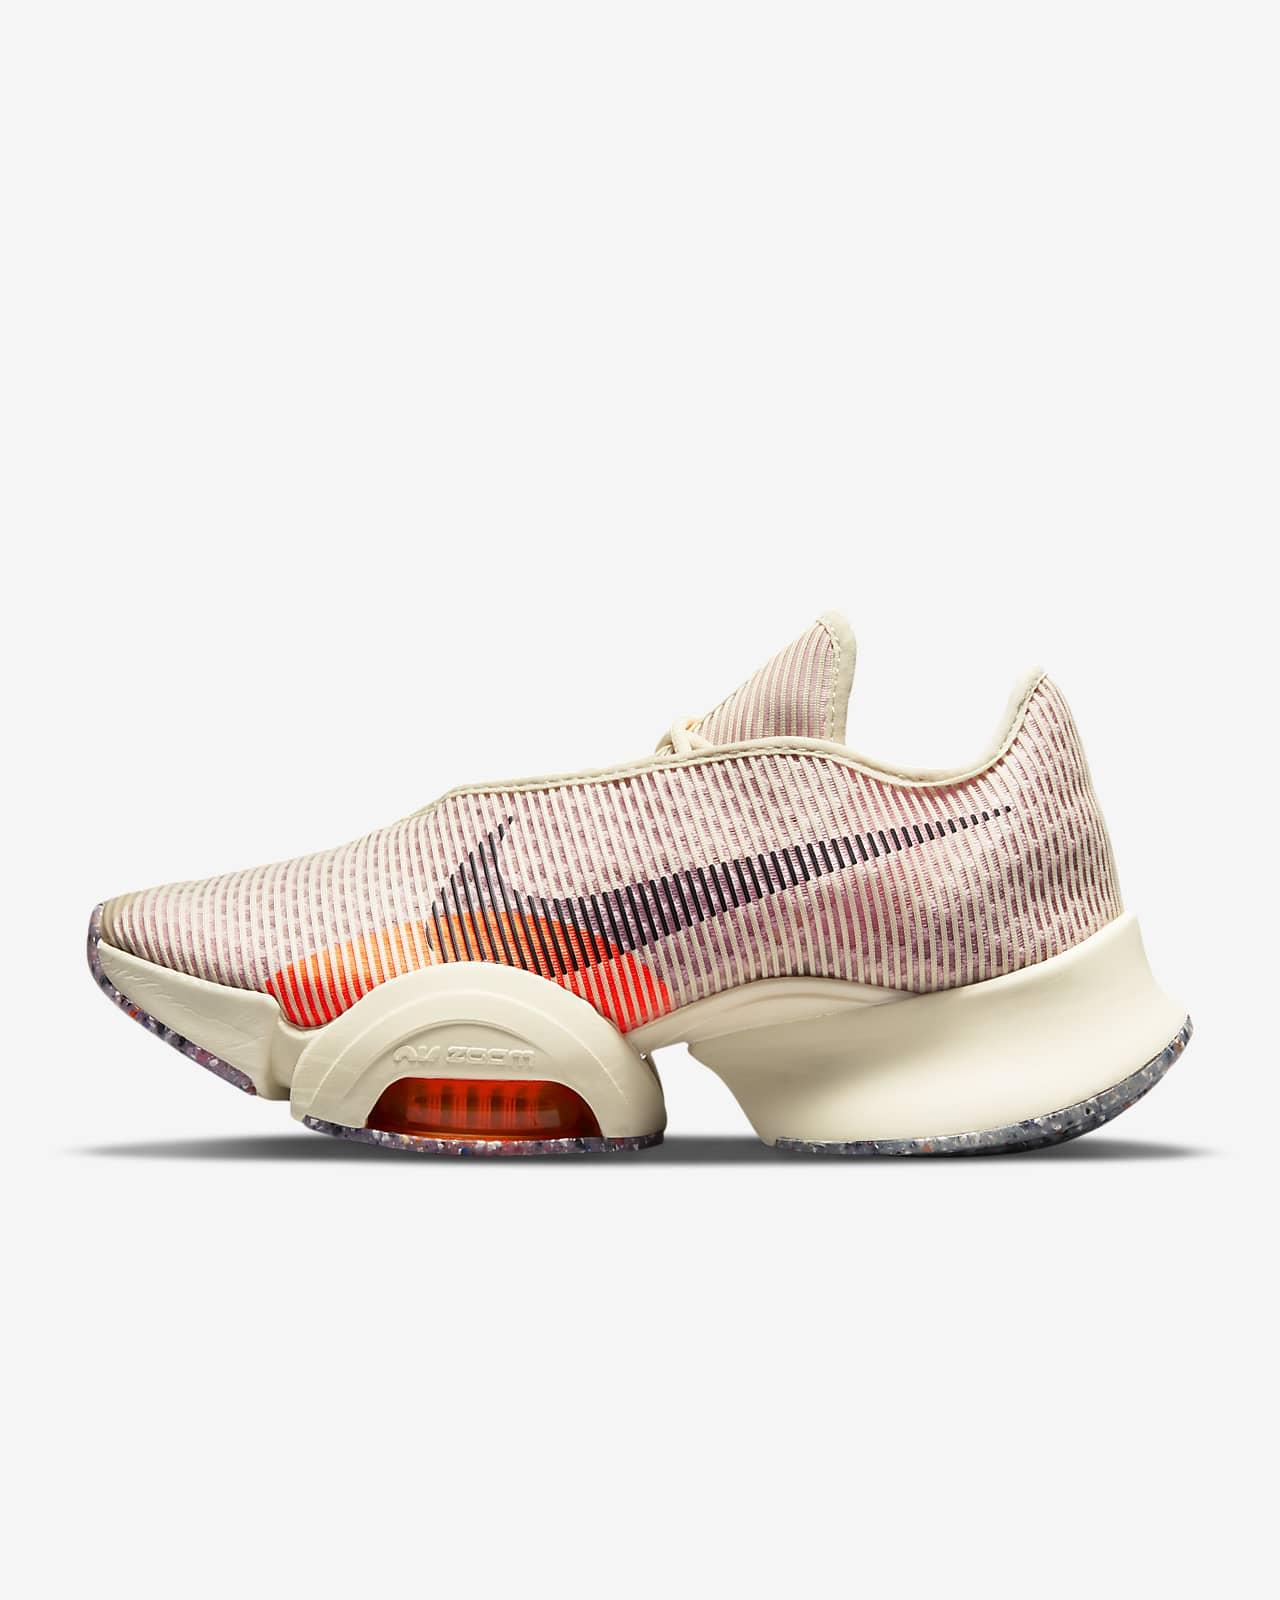 Nike Air Zoom SuperRep 2 Next Nature Women's HIIT Class Shoe